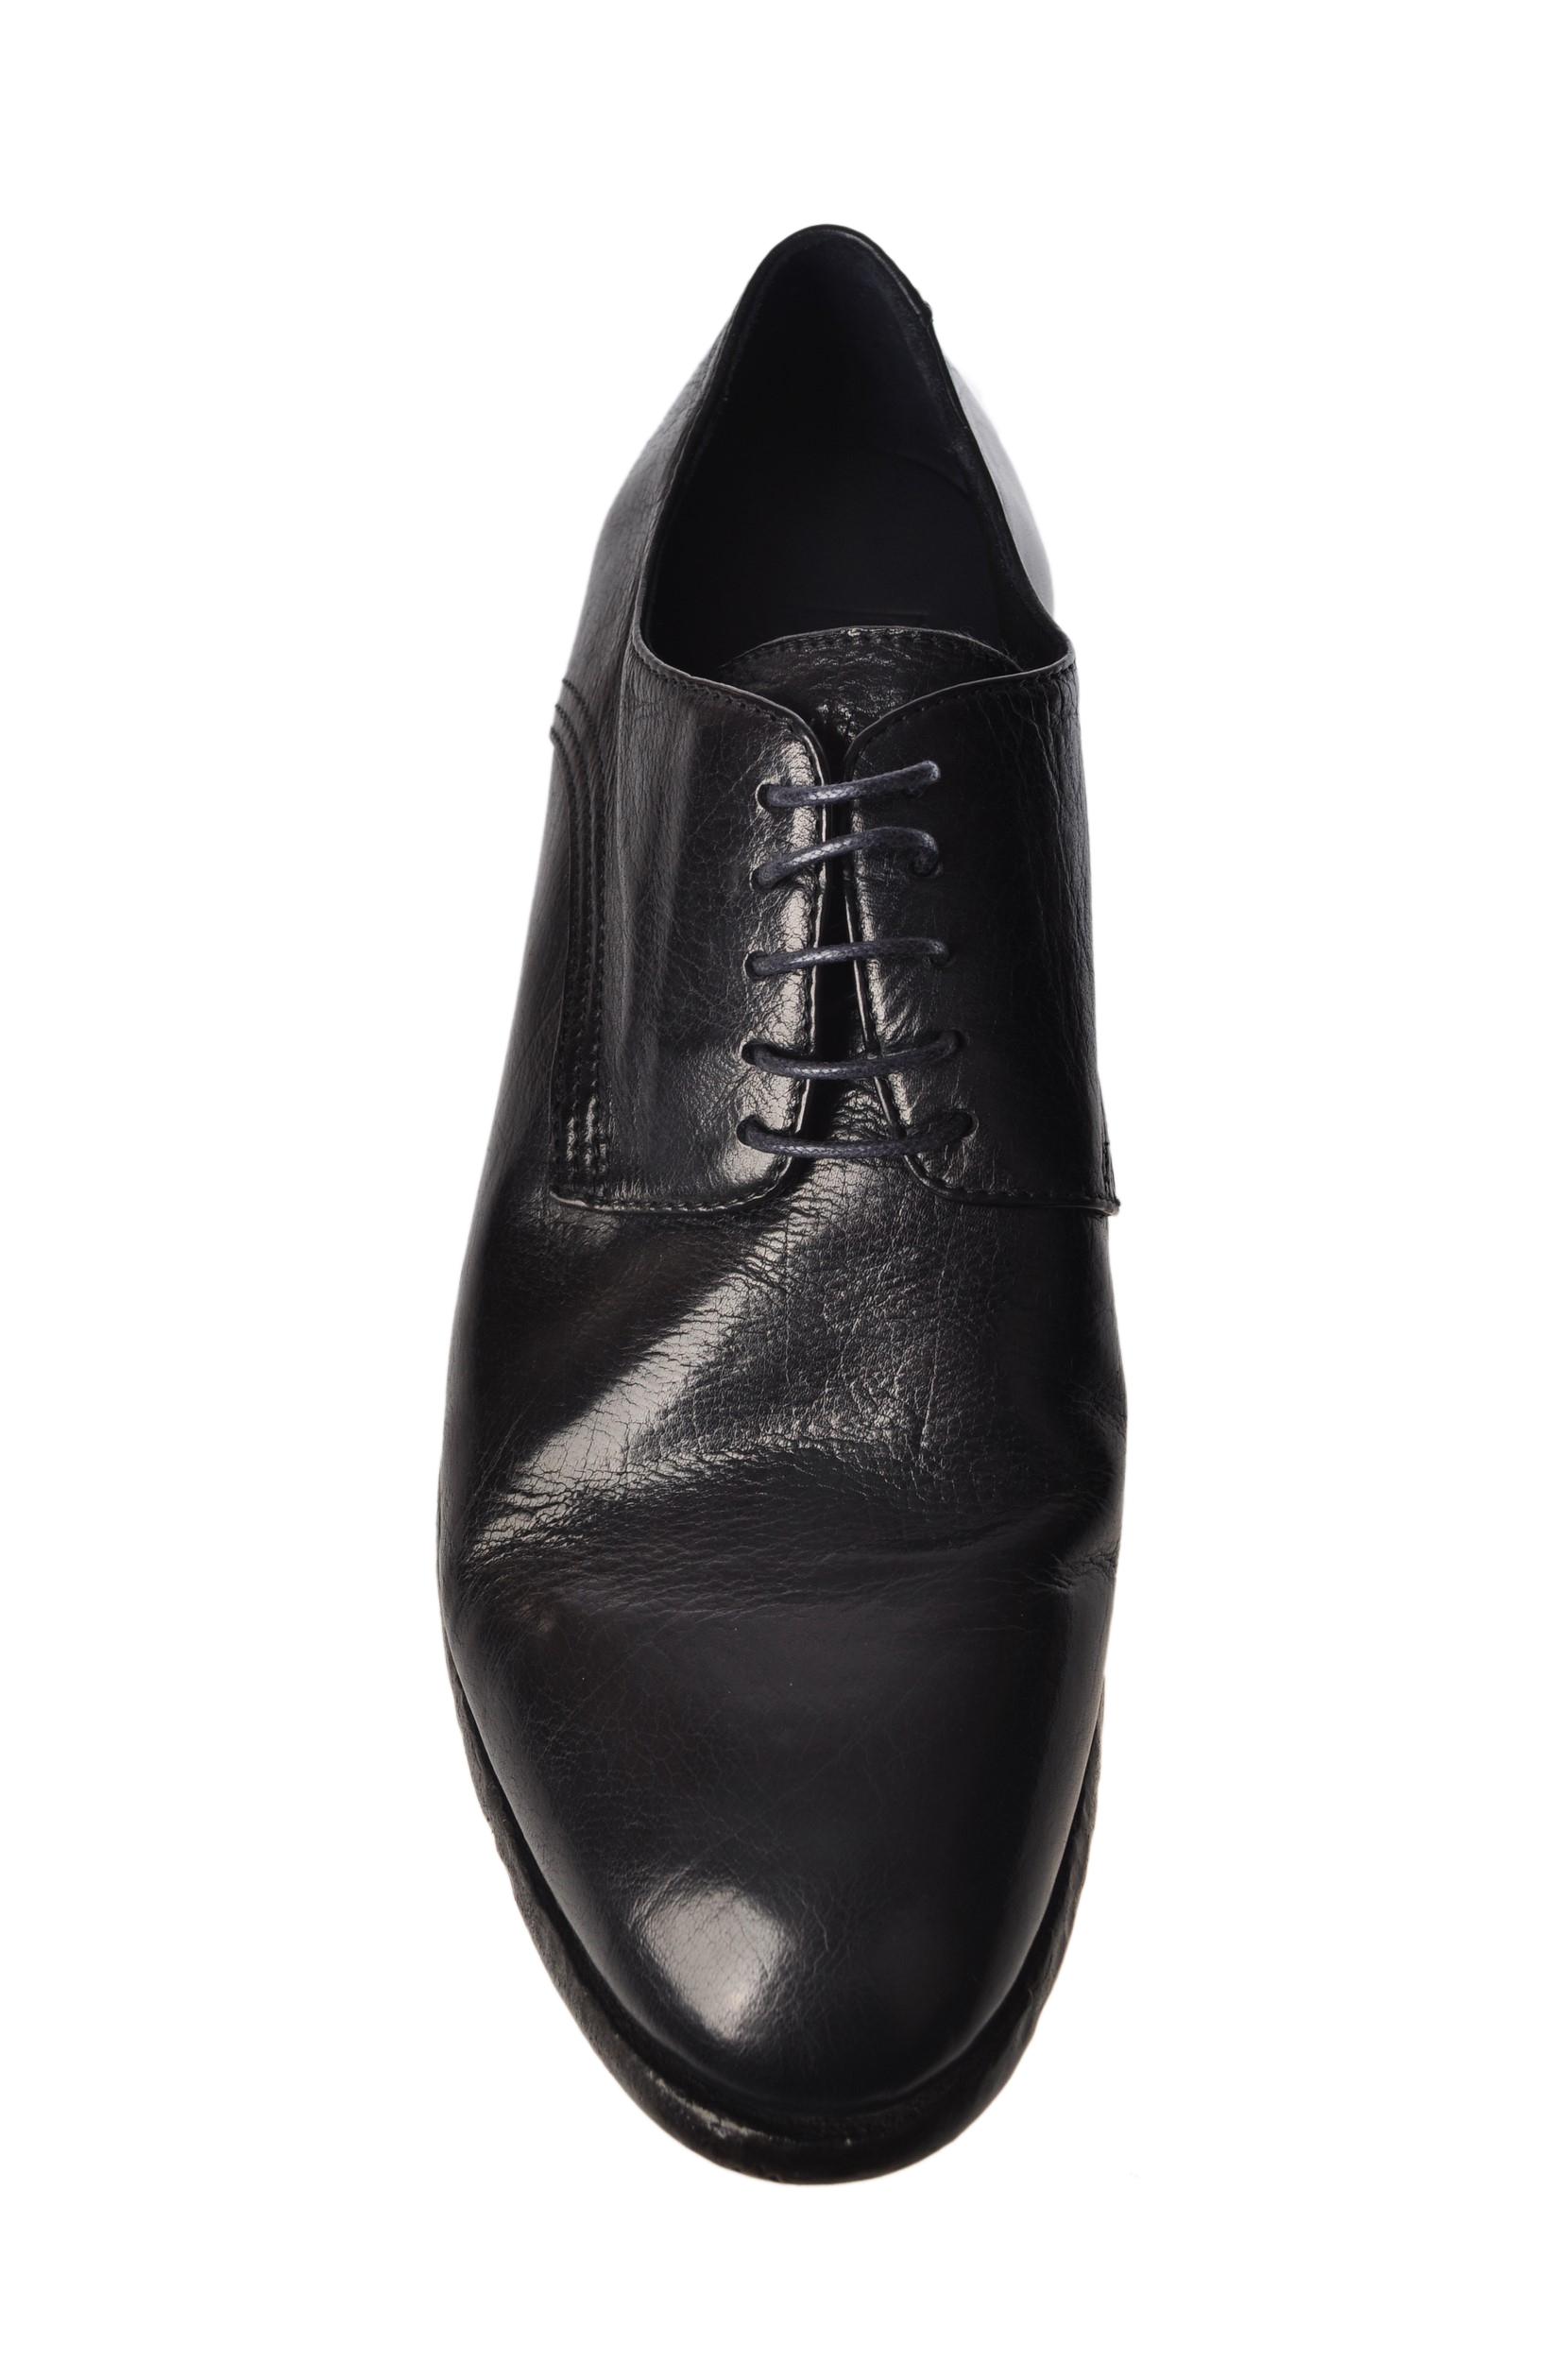 "Openclosedshoes ""5533"" Stringate"